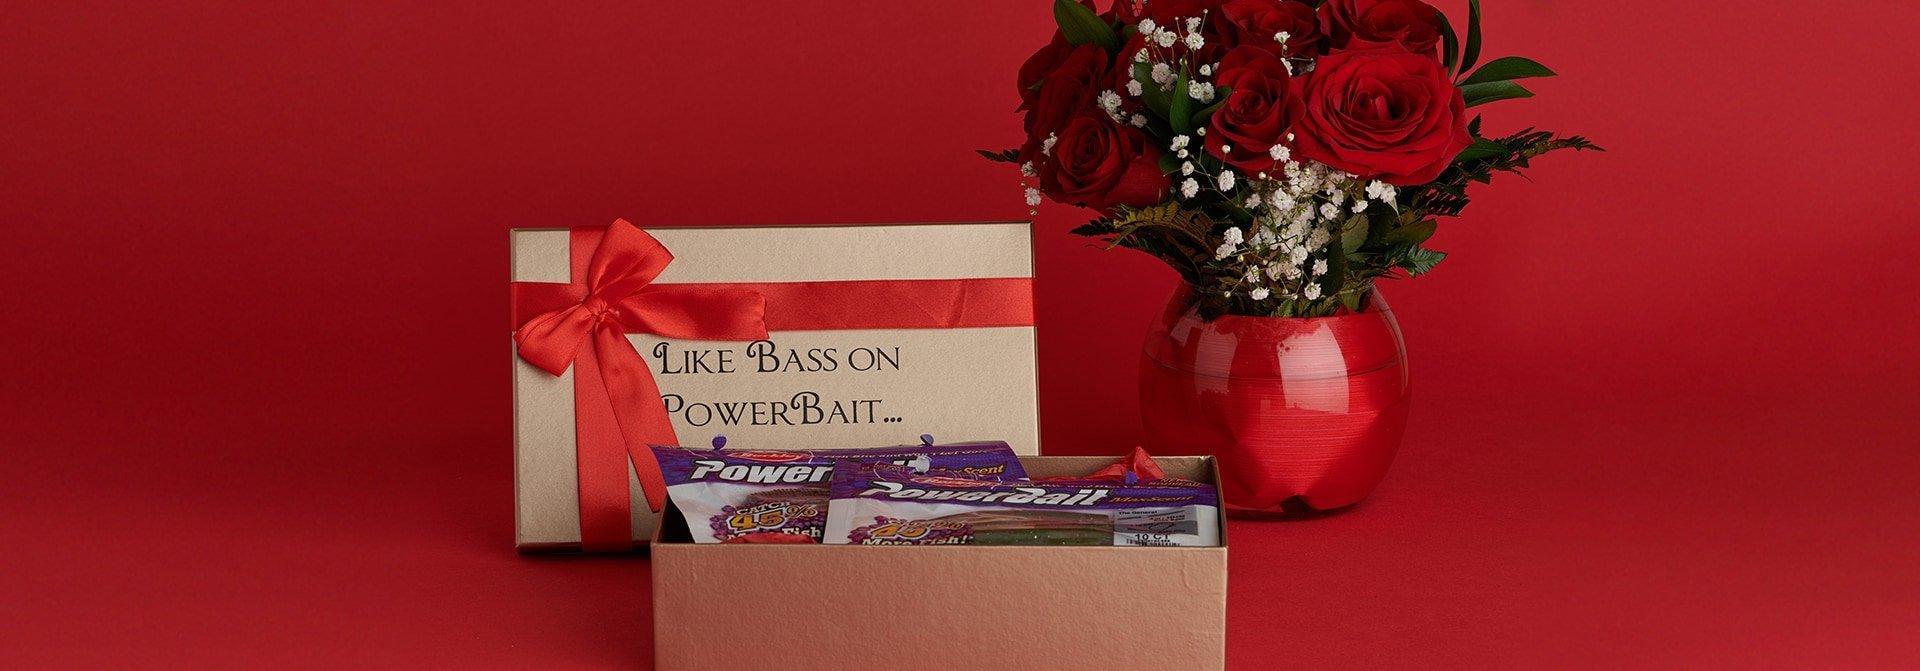 Powerbait gift pack